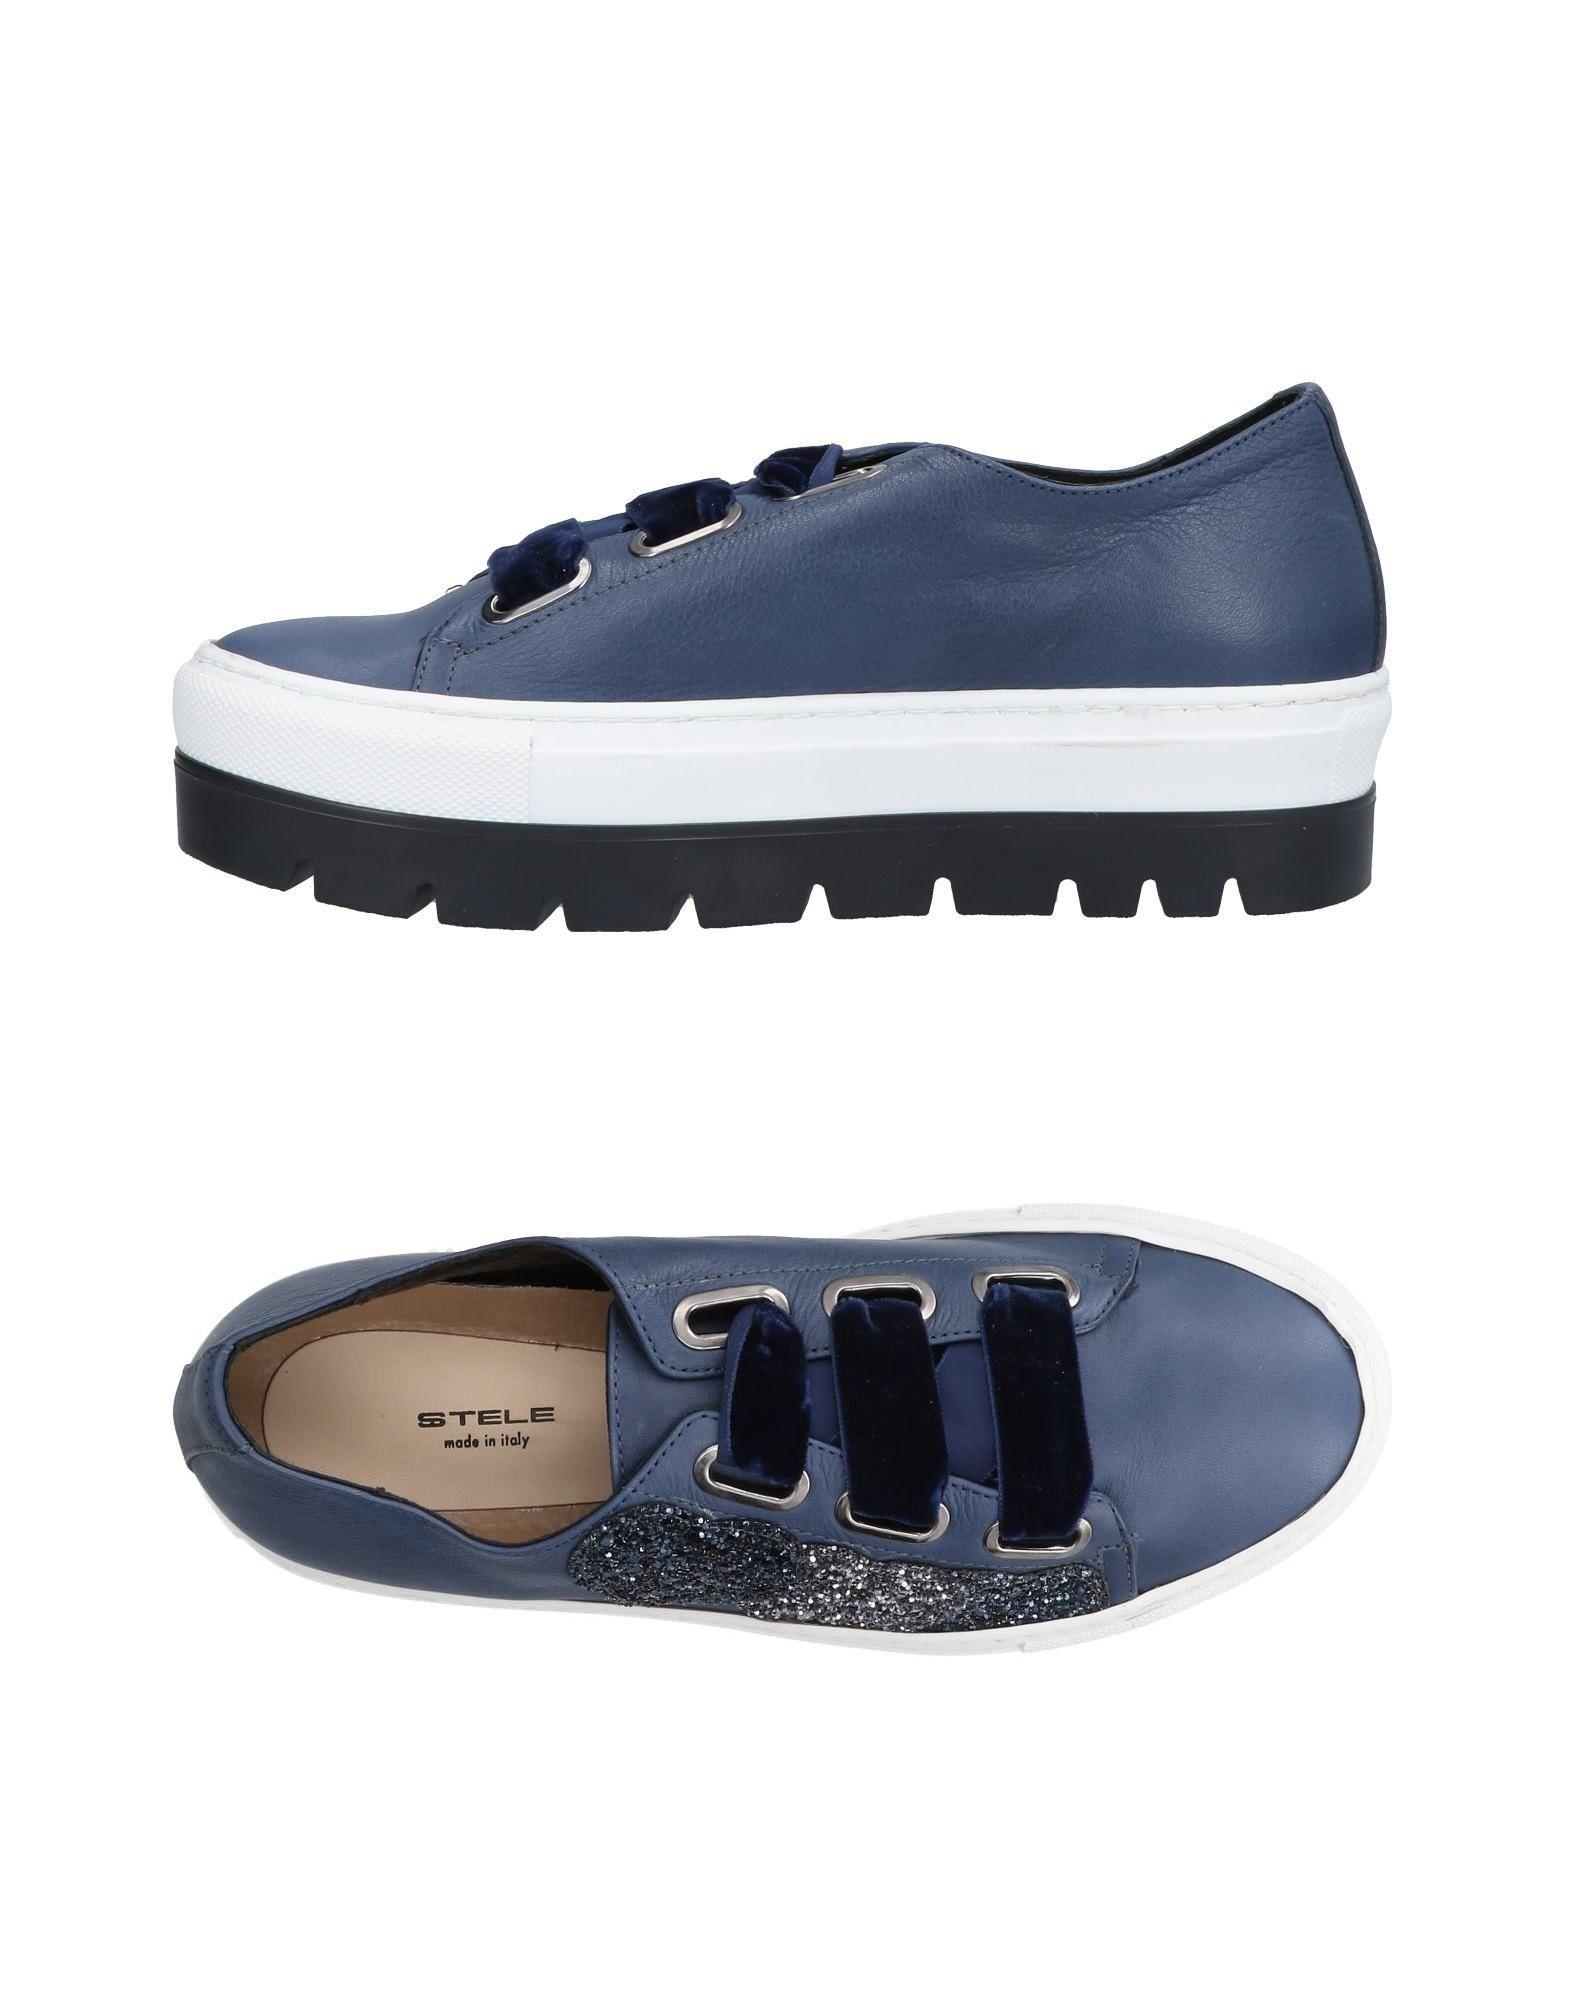 Donna Stele su Acquista Sneakers online 5qHAH